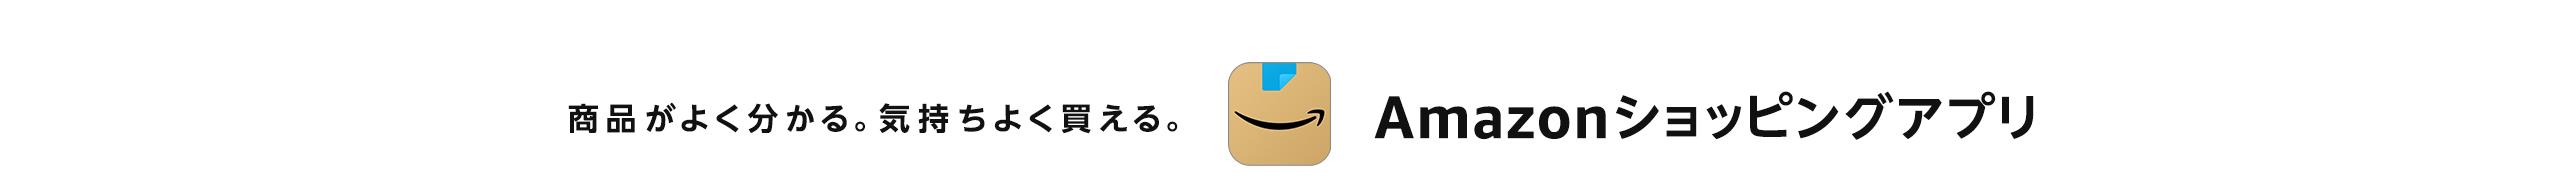 Amazonショッピングアプリは、各アプリストアから無料ダウンロード